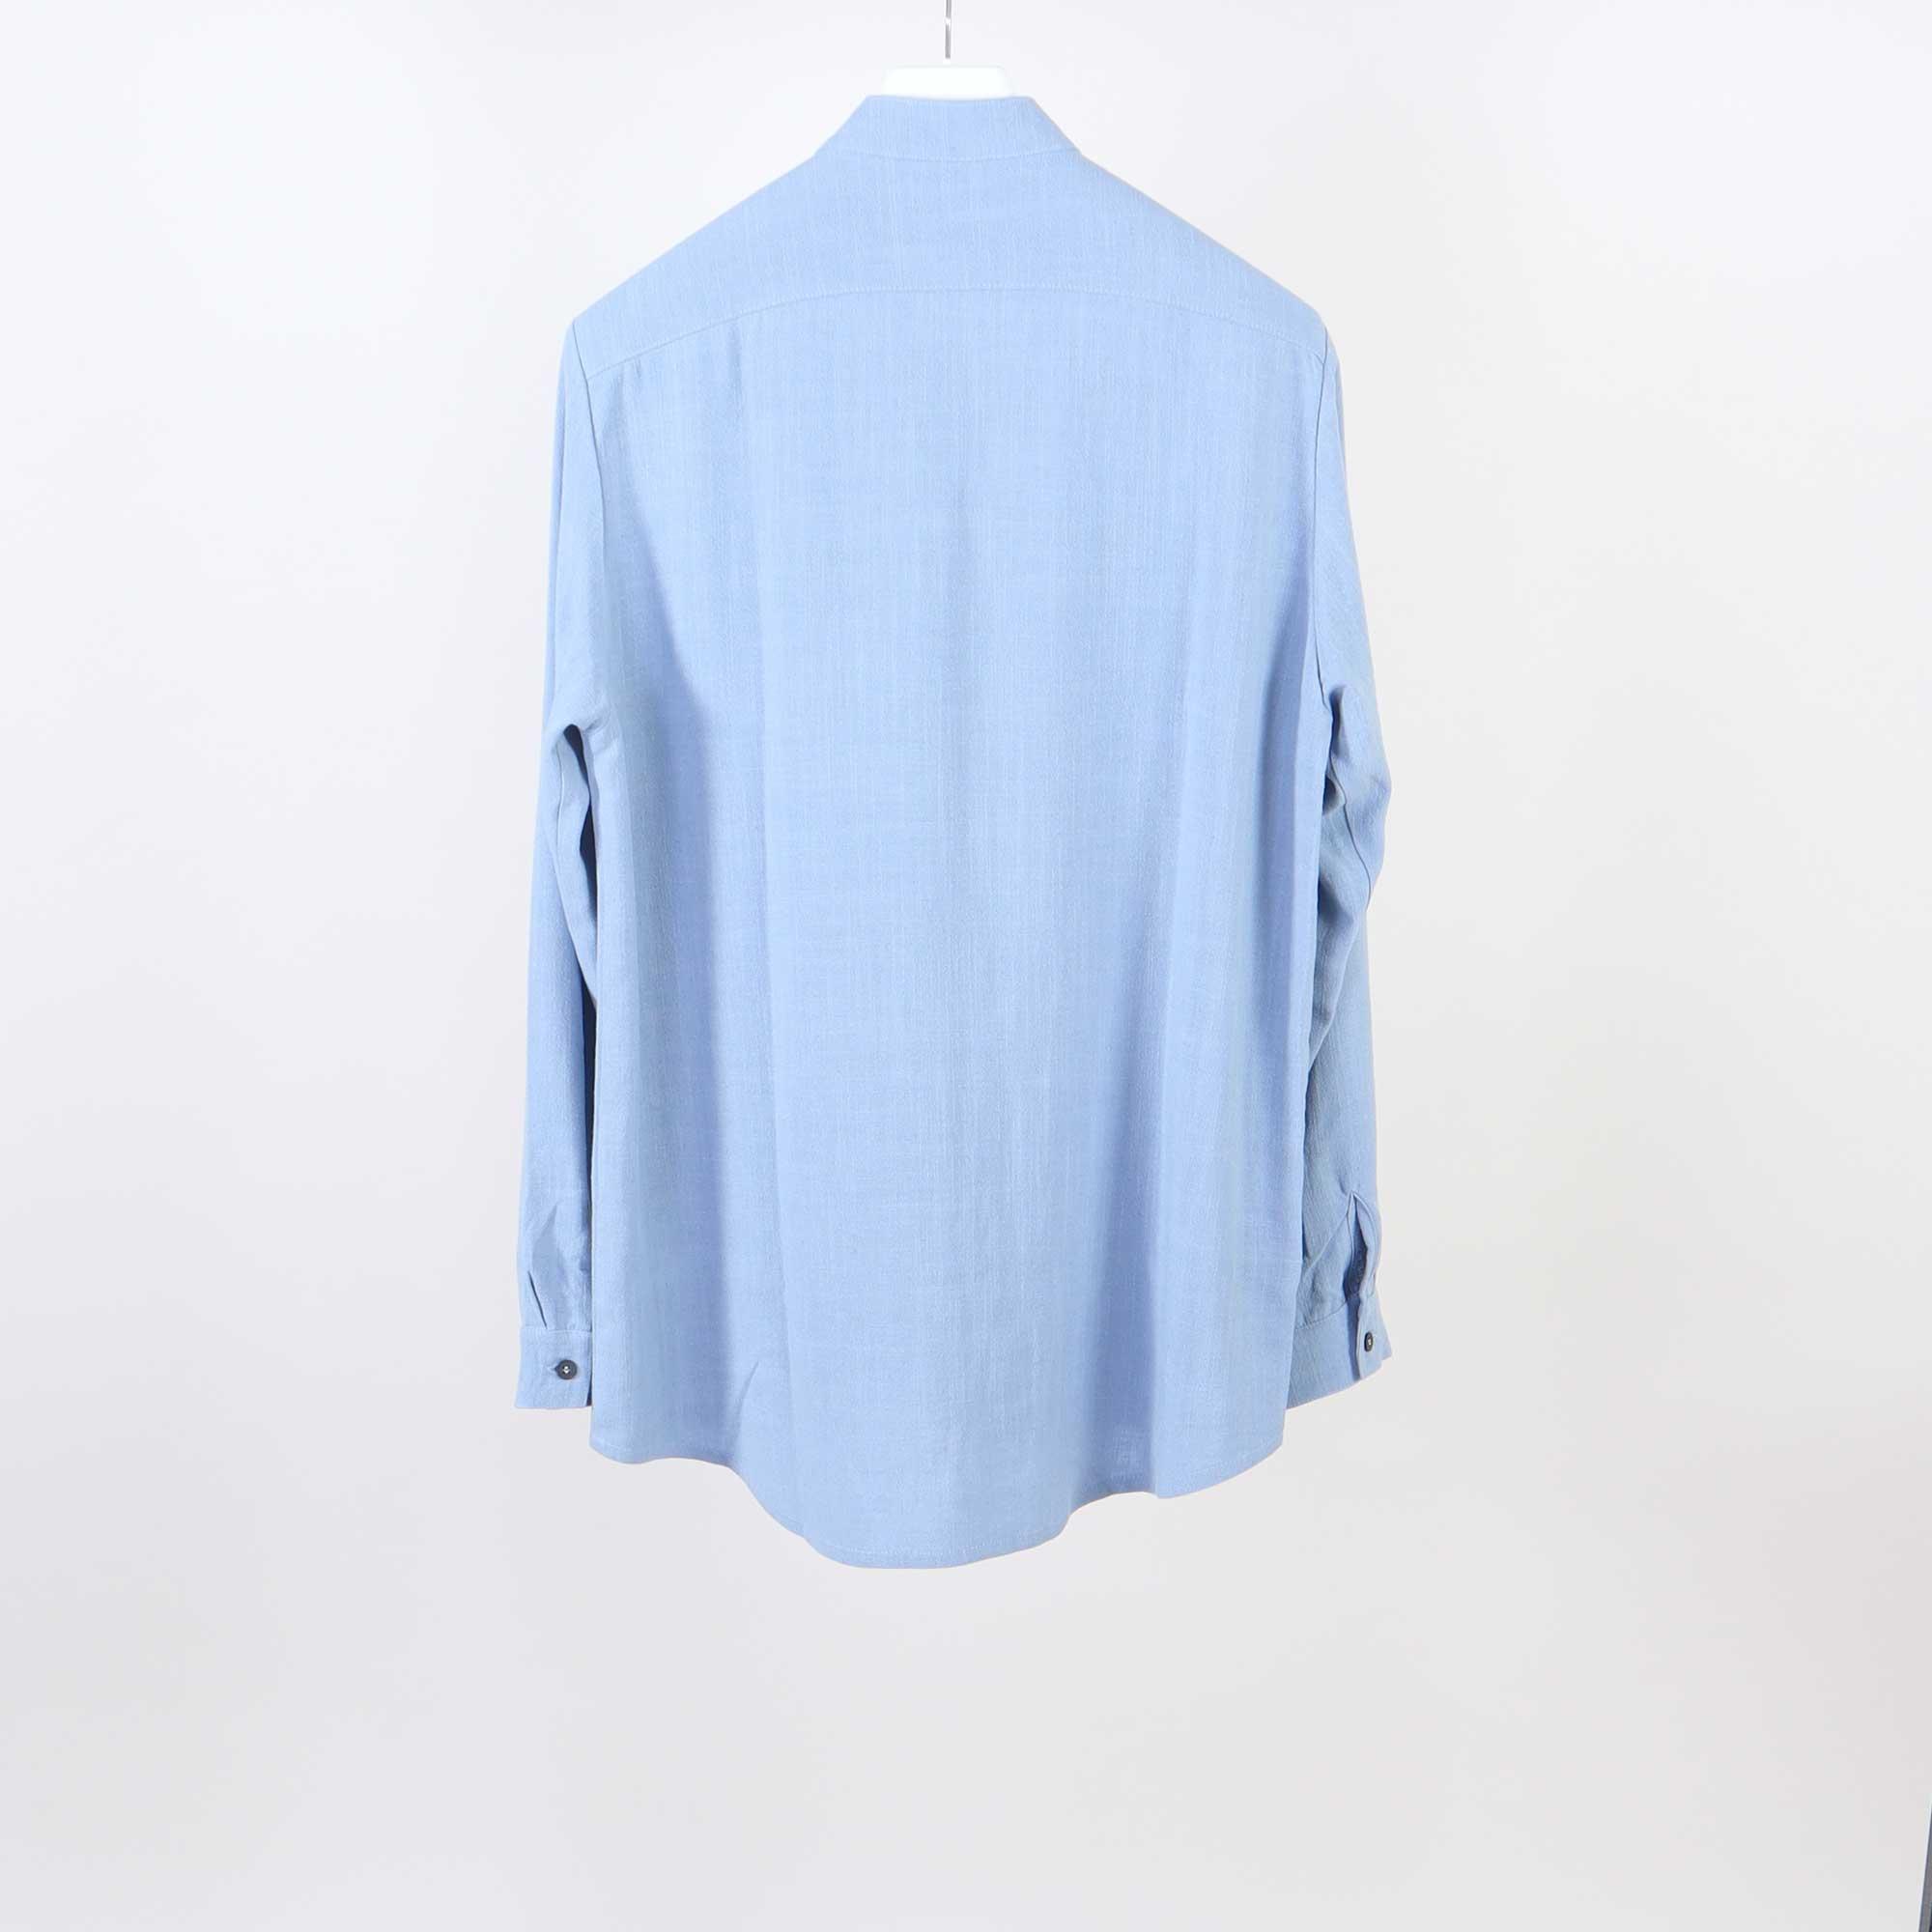 zippy-blauw-6